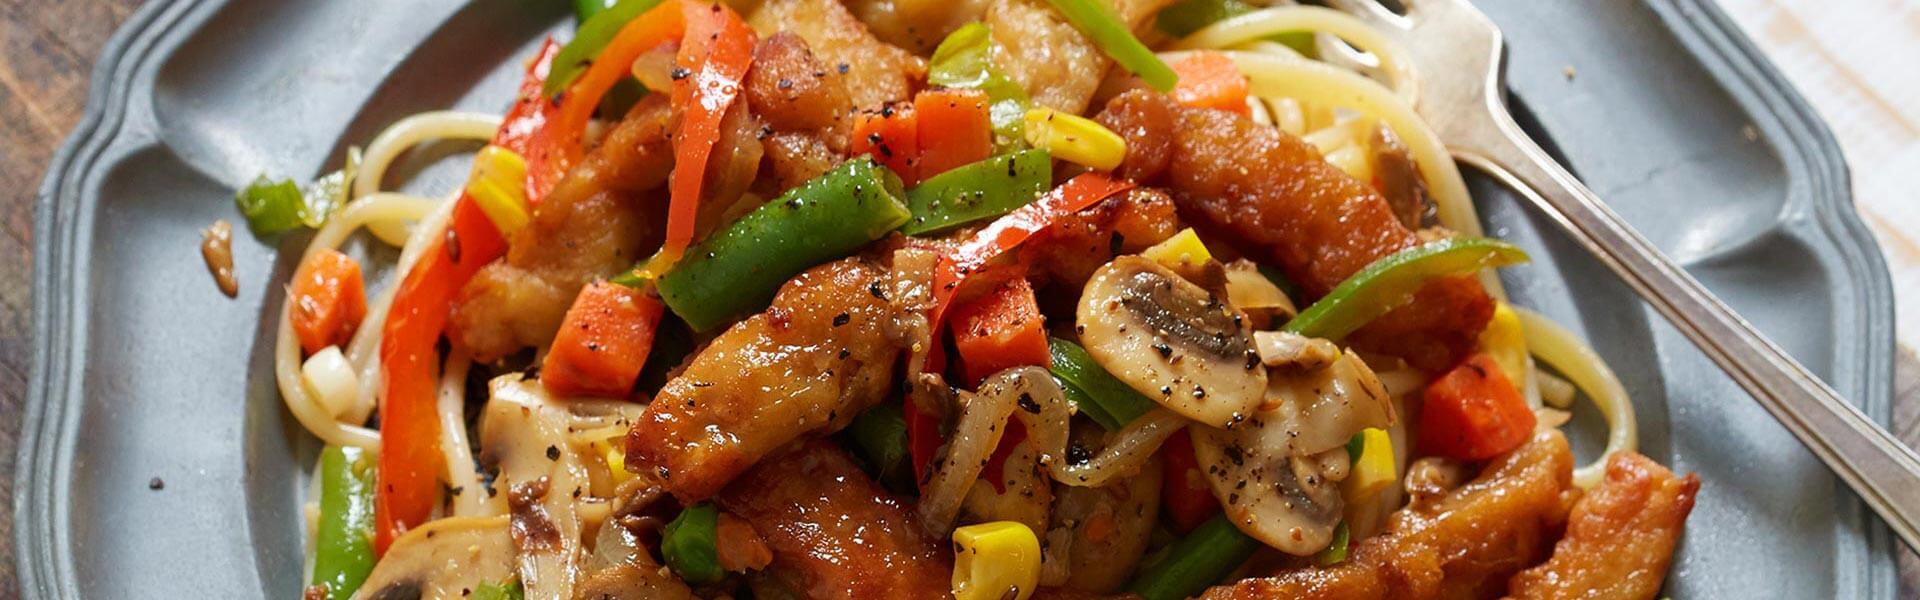 chicken-style-veg-pasta